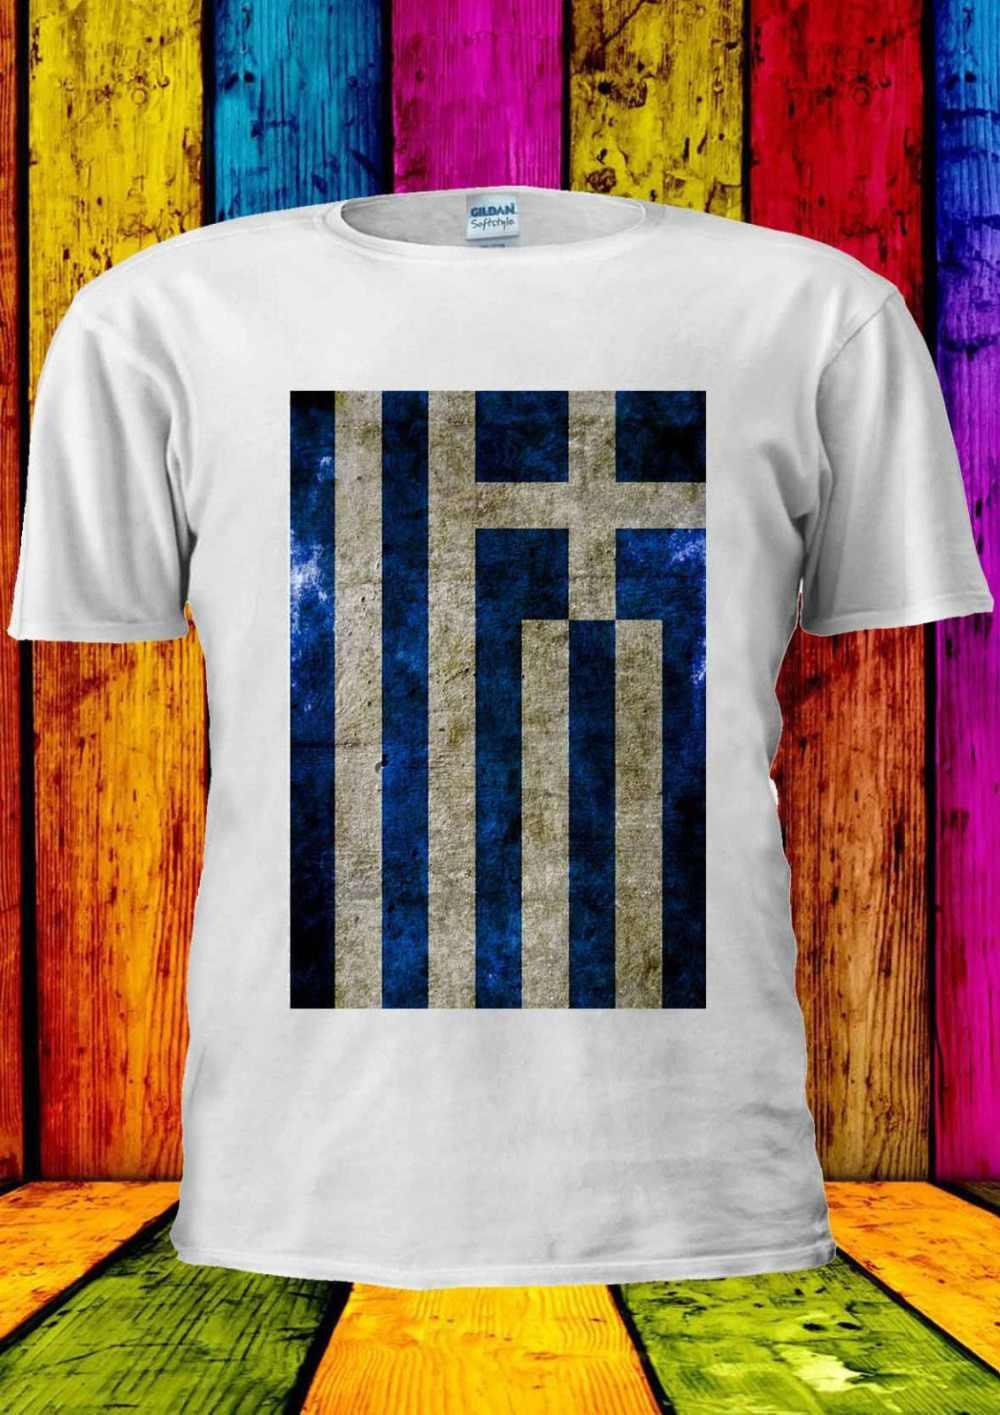 Летняя мужская Повседневная мода греческий флаг Винтаж Афины Футболка Топ